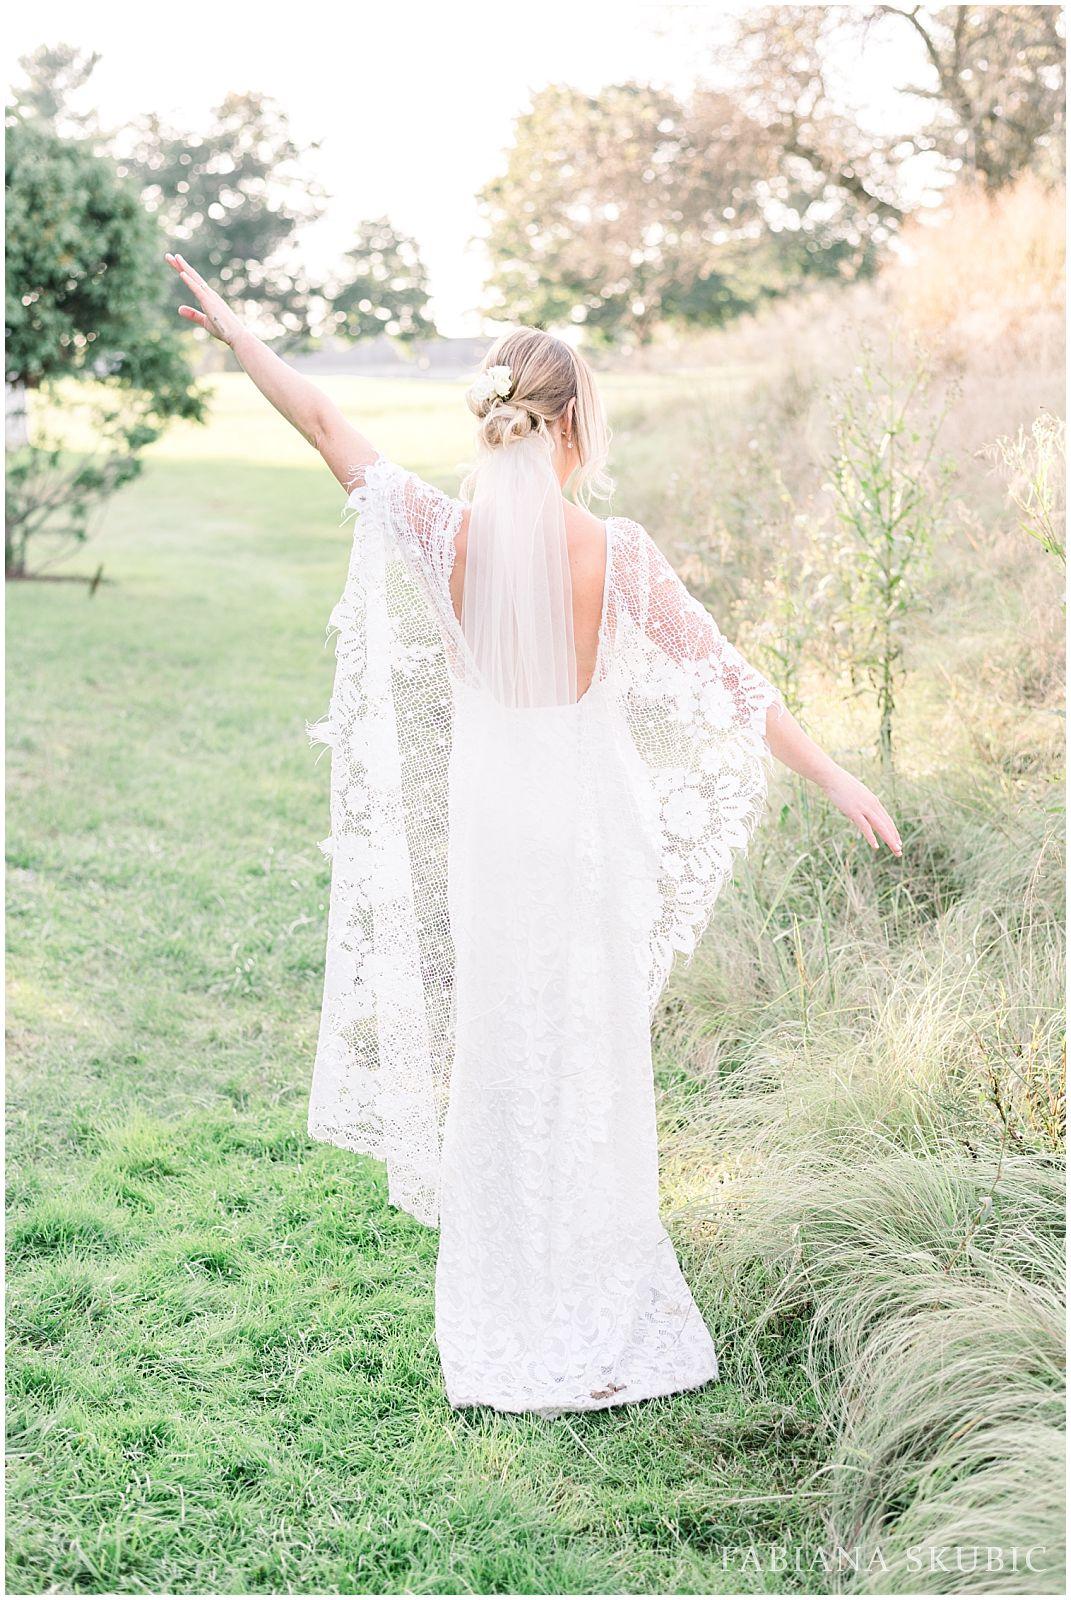 FabianaSkubic_H&M_Wedding_0062.jpg